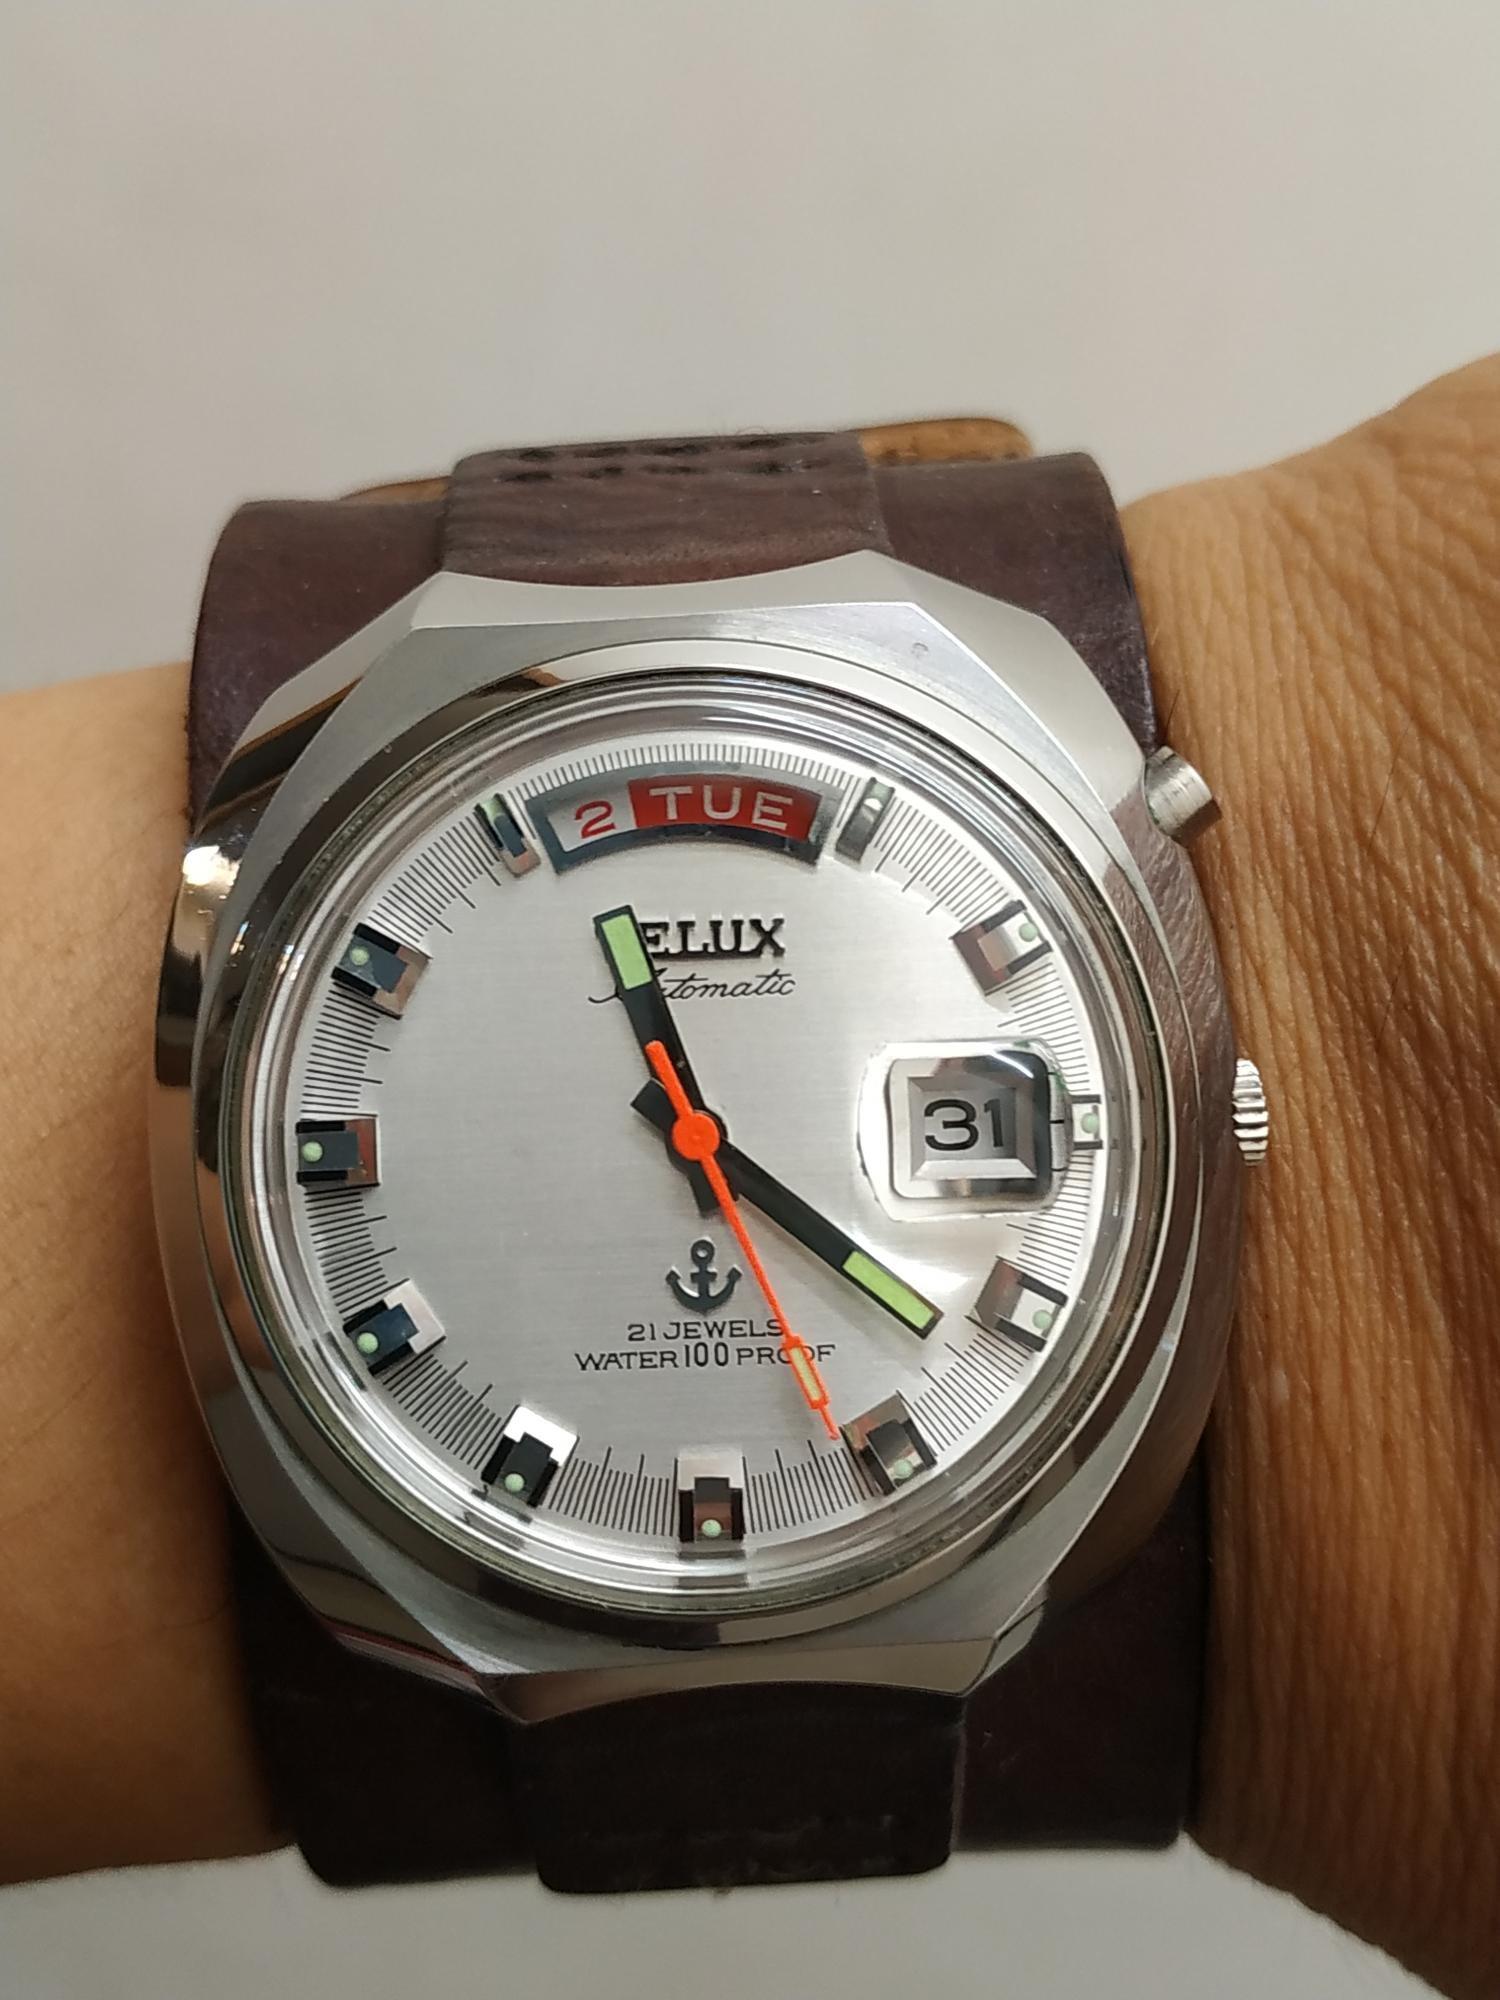 Telux 鐵力士 古早 機械錶 拆機保養 拋光都做好了 用fossil